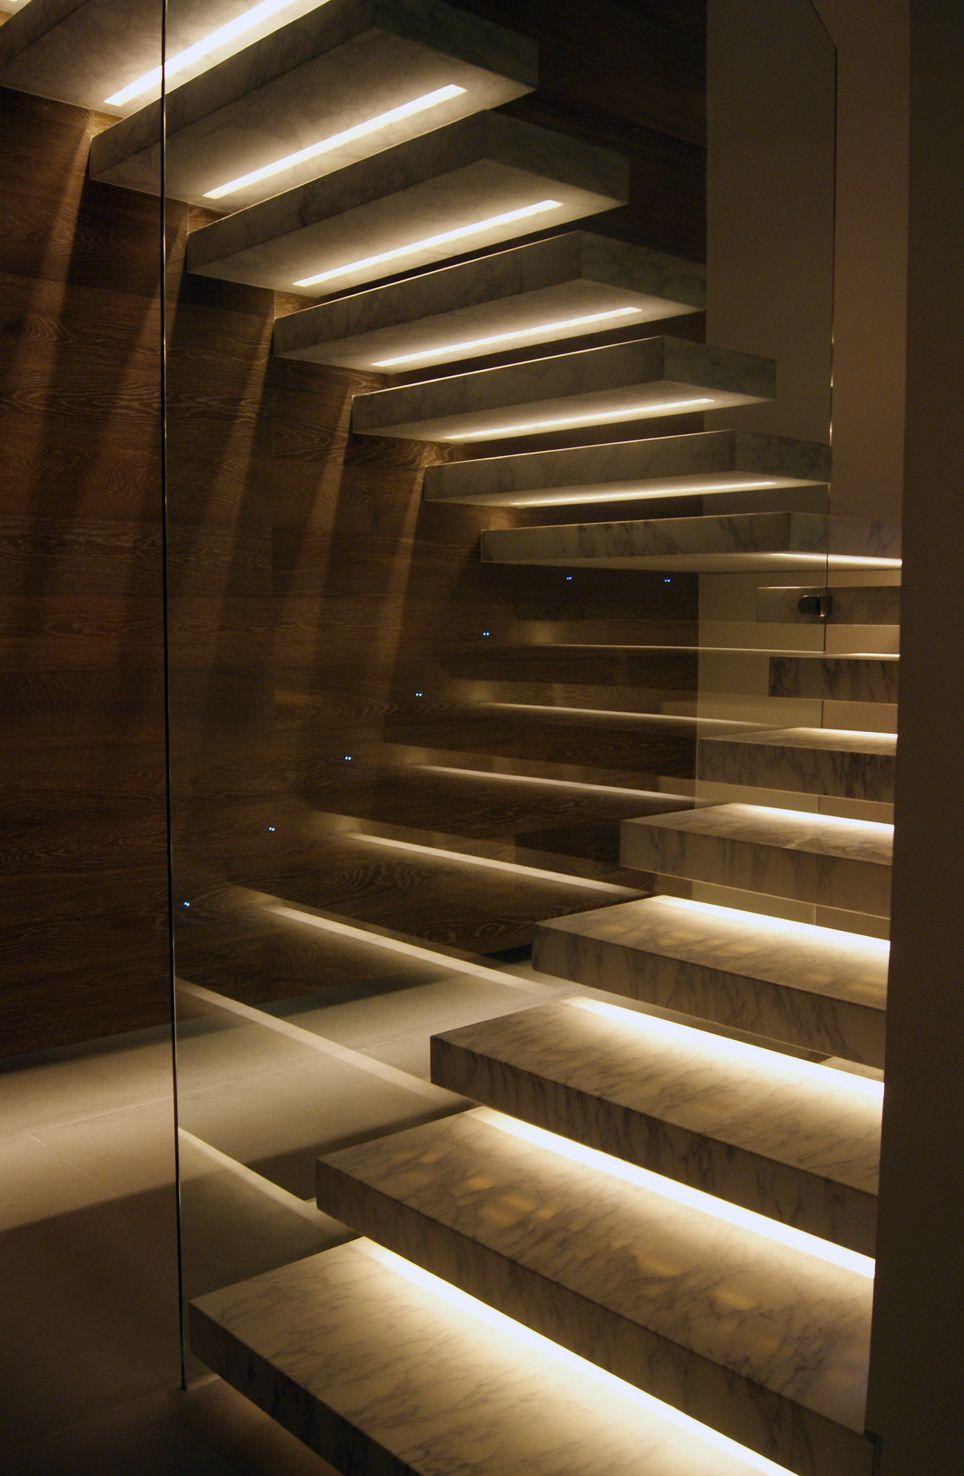 interior stairway lighting. Most Popular Light For Stairways, Check It Out :) #homeideas #stairways. Interior Stairway Lighting